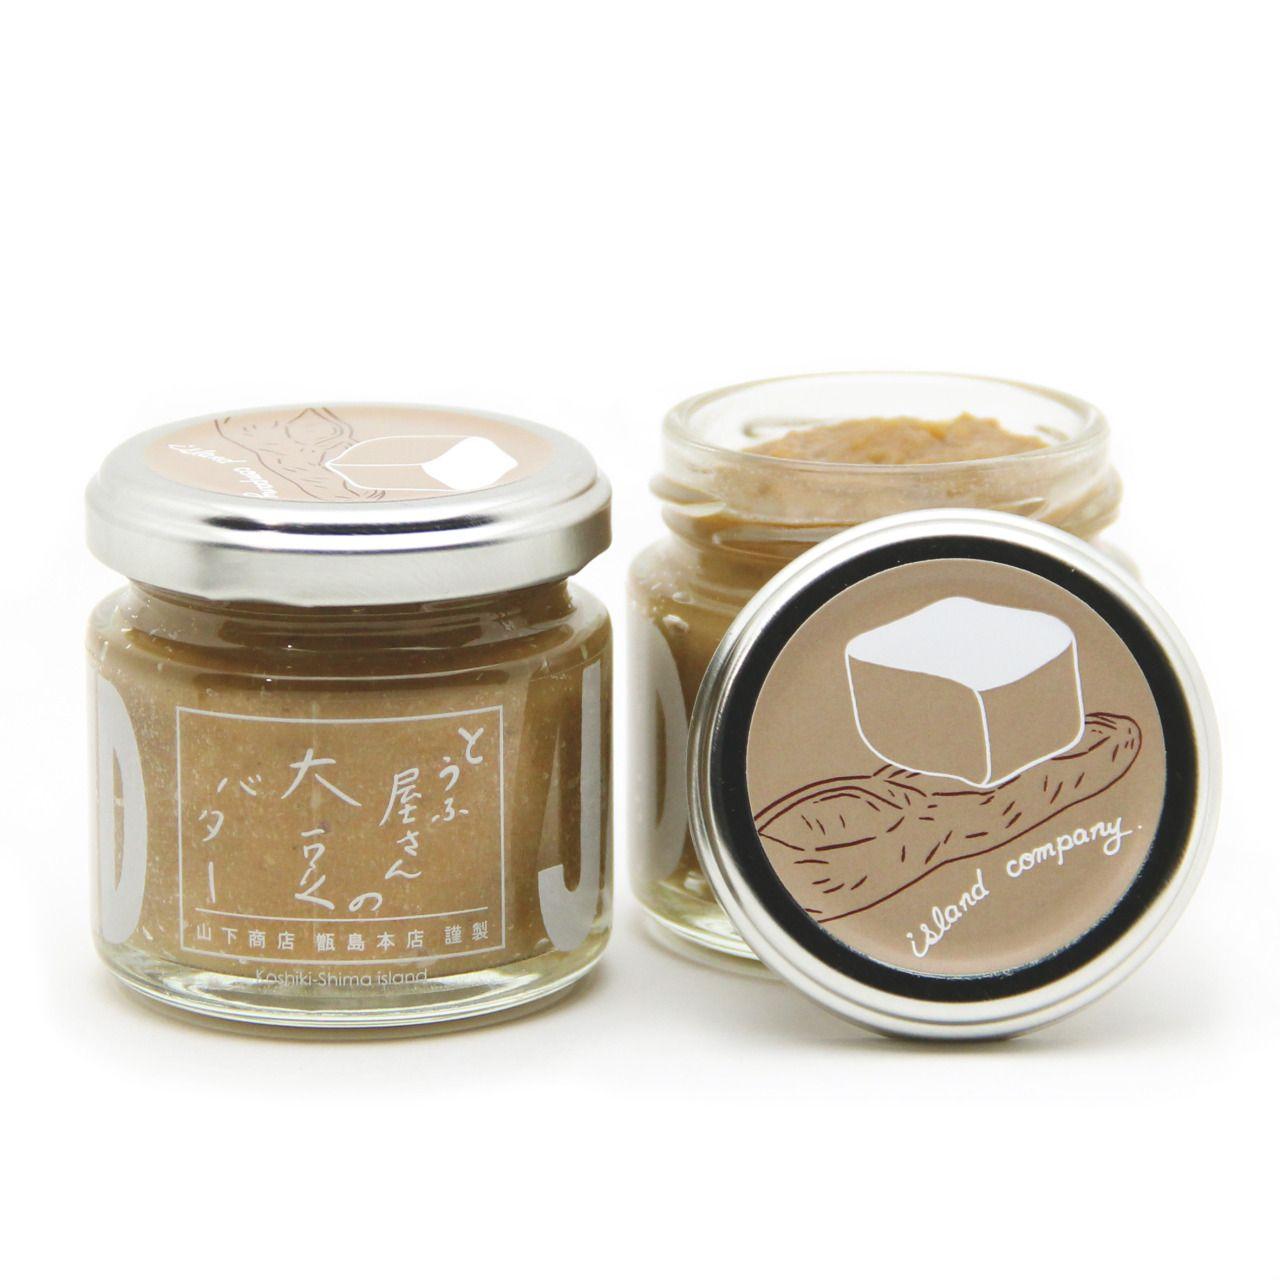 SOY JAM packaging design